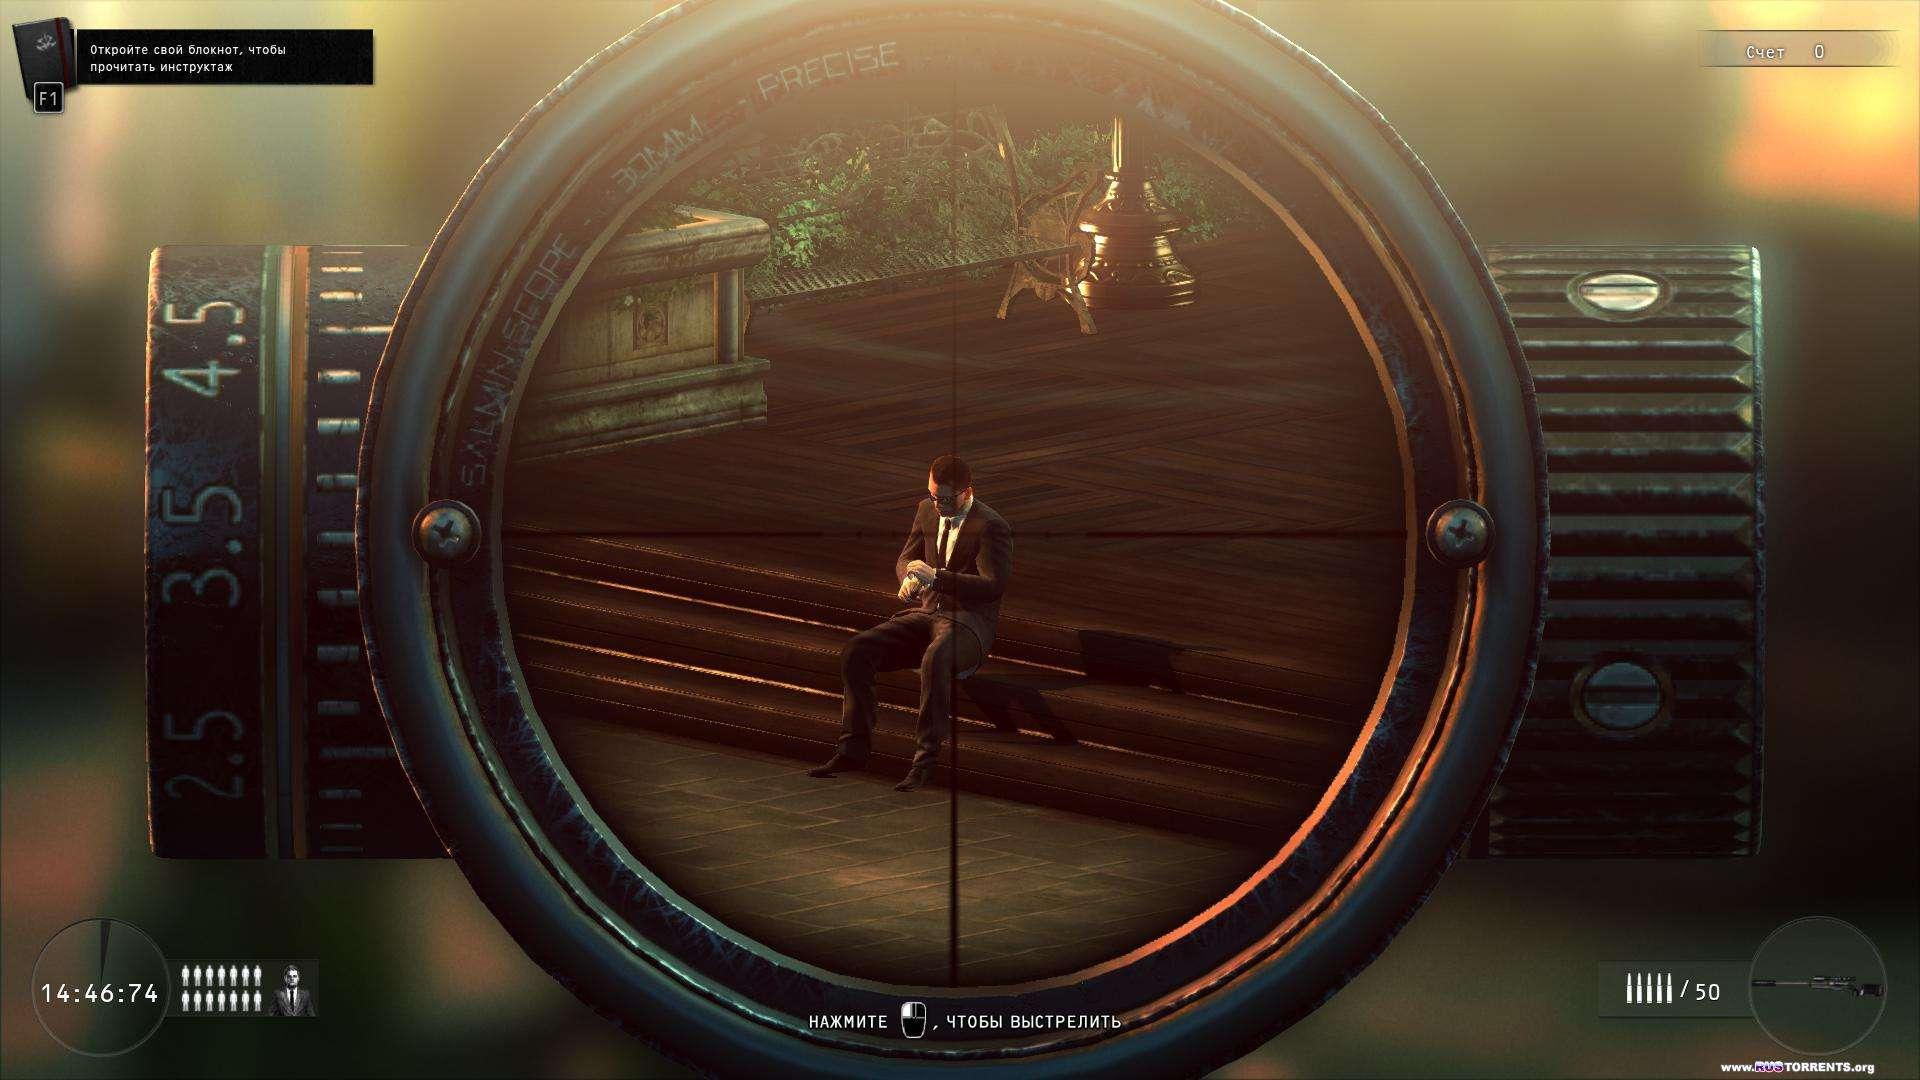 Hitman: Sniper Challenge | RePack от R.G. Revenants